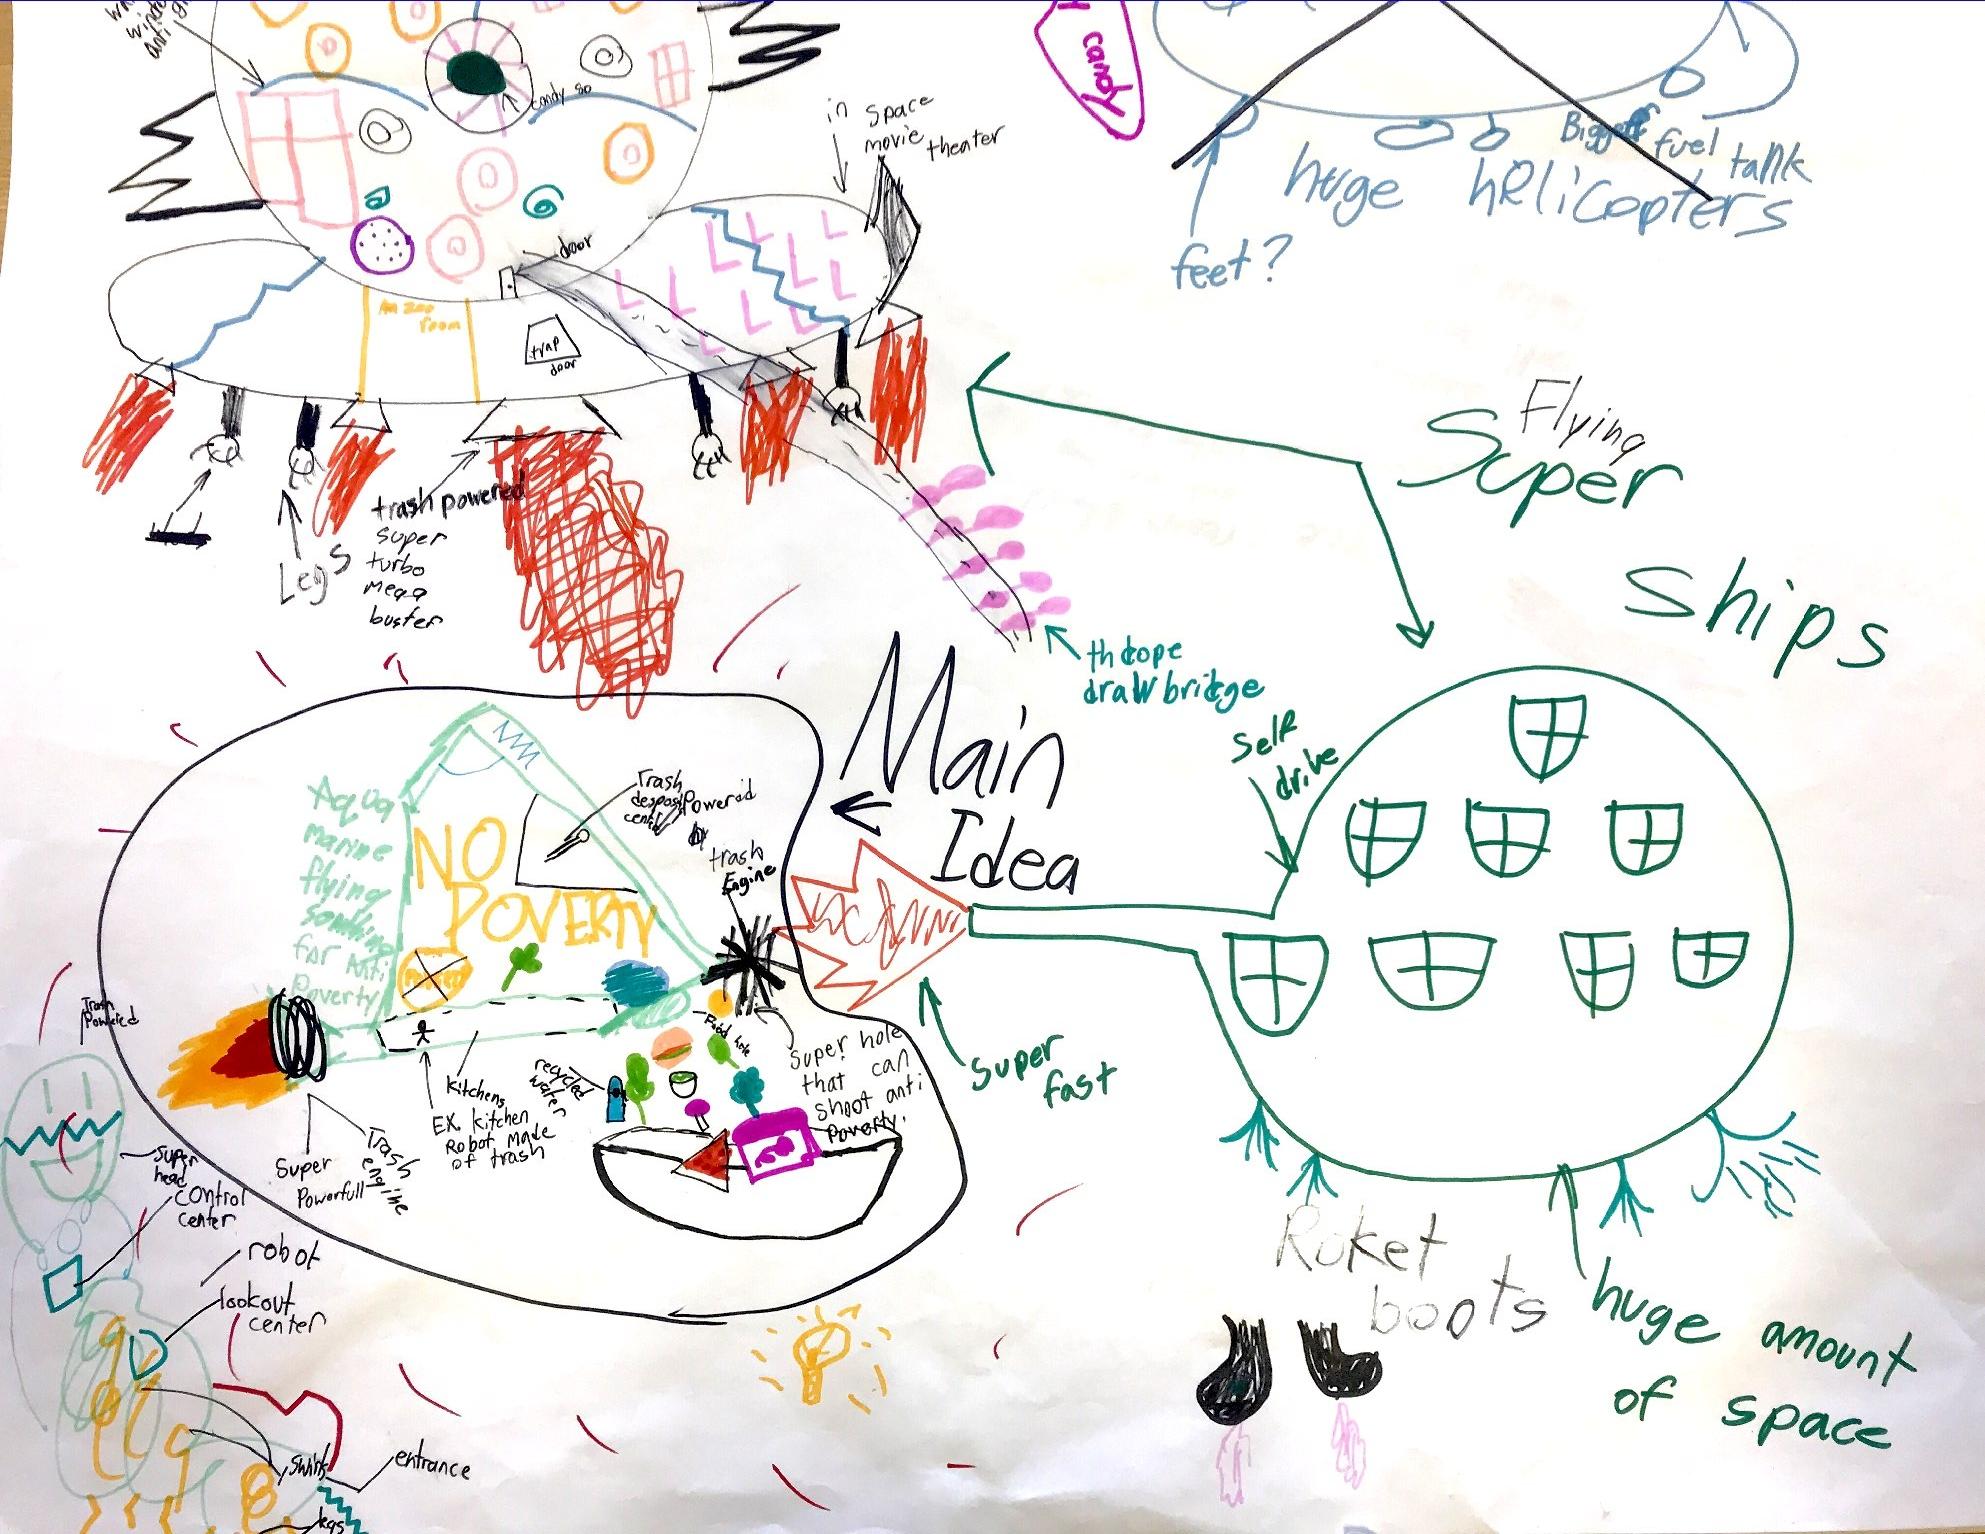 lower El innovation brainstorms-page-13.jpg